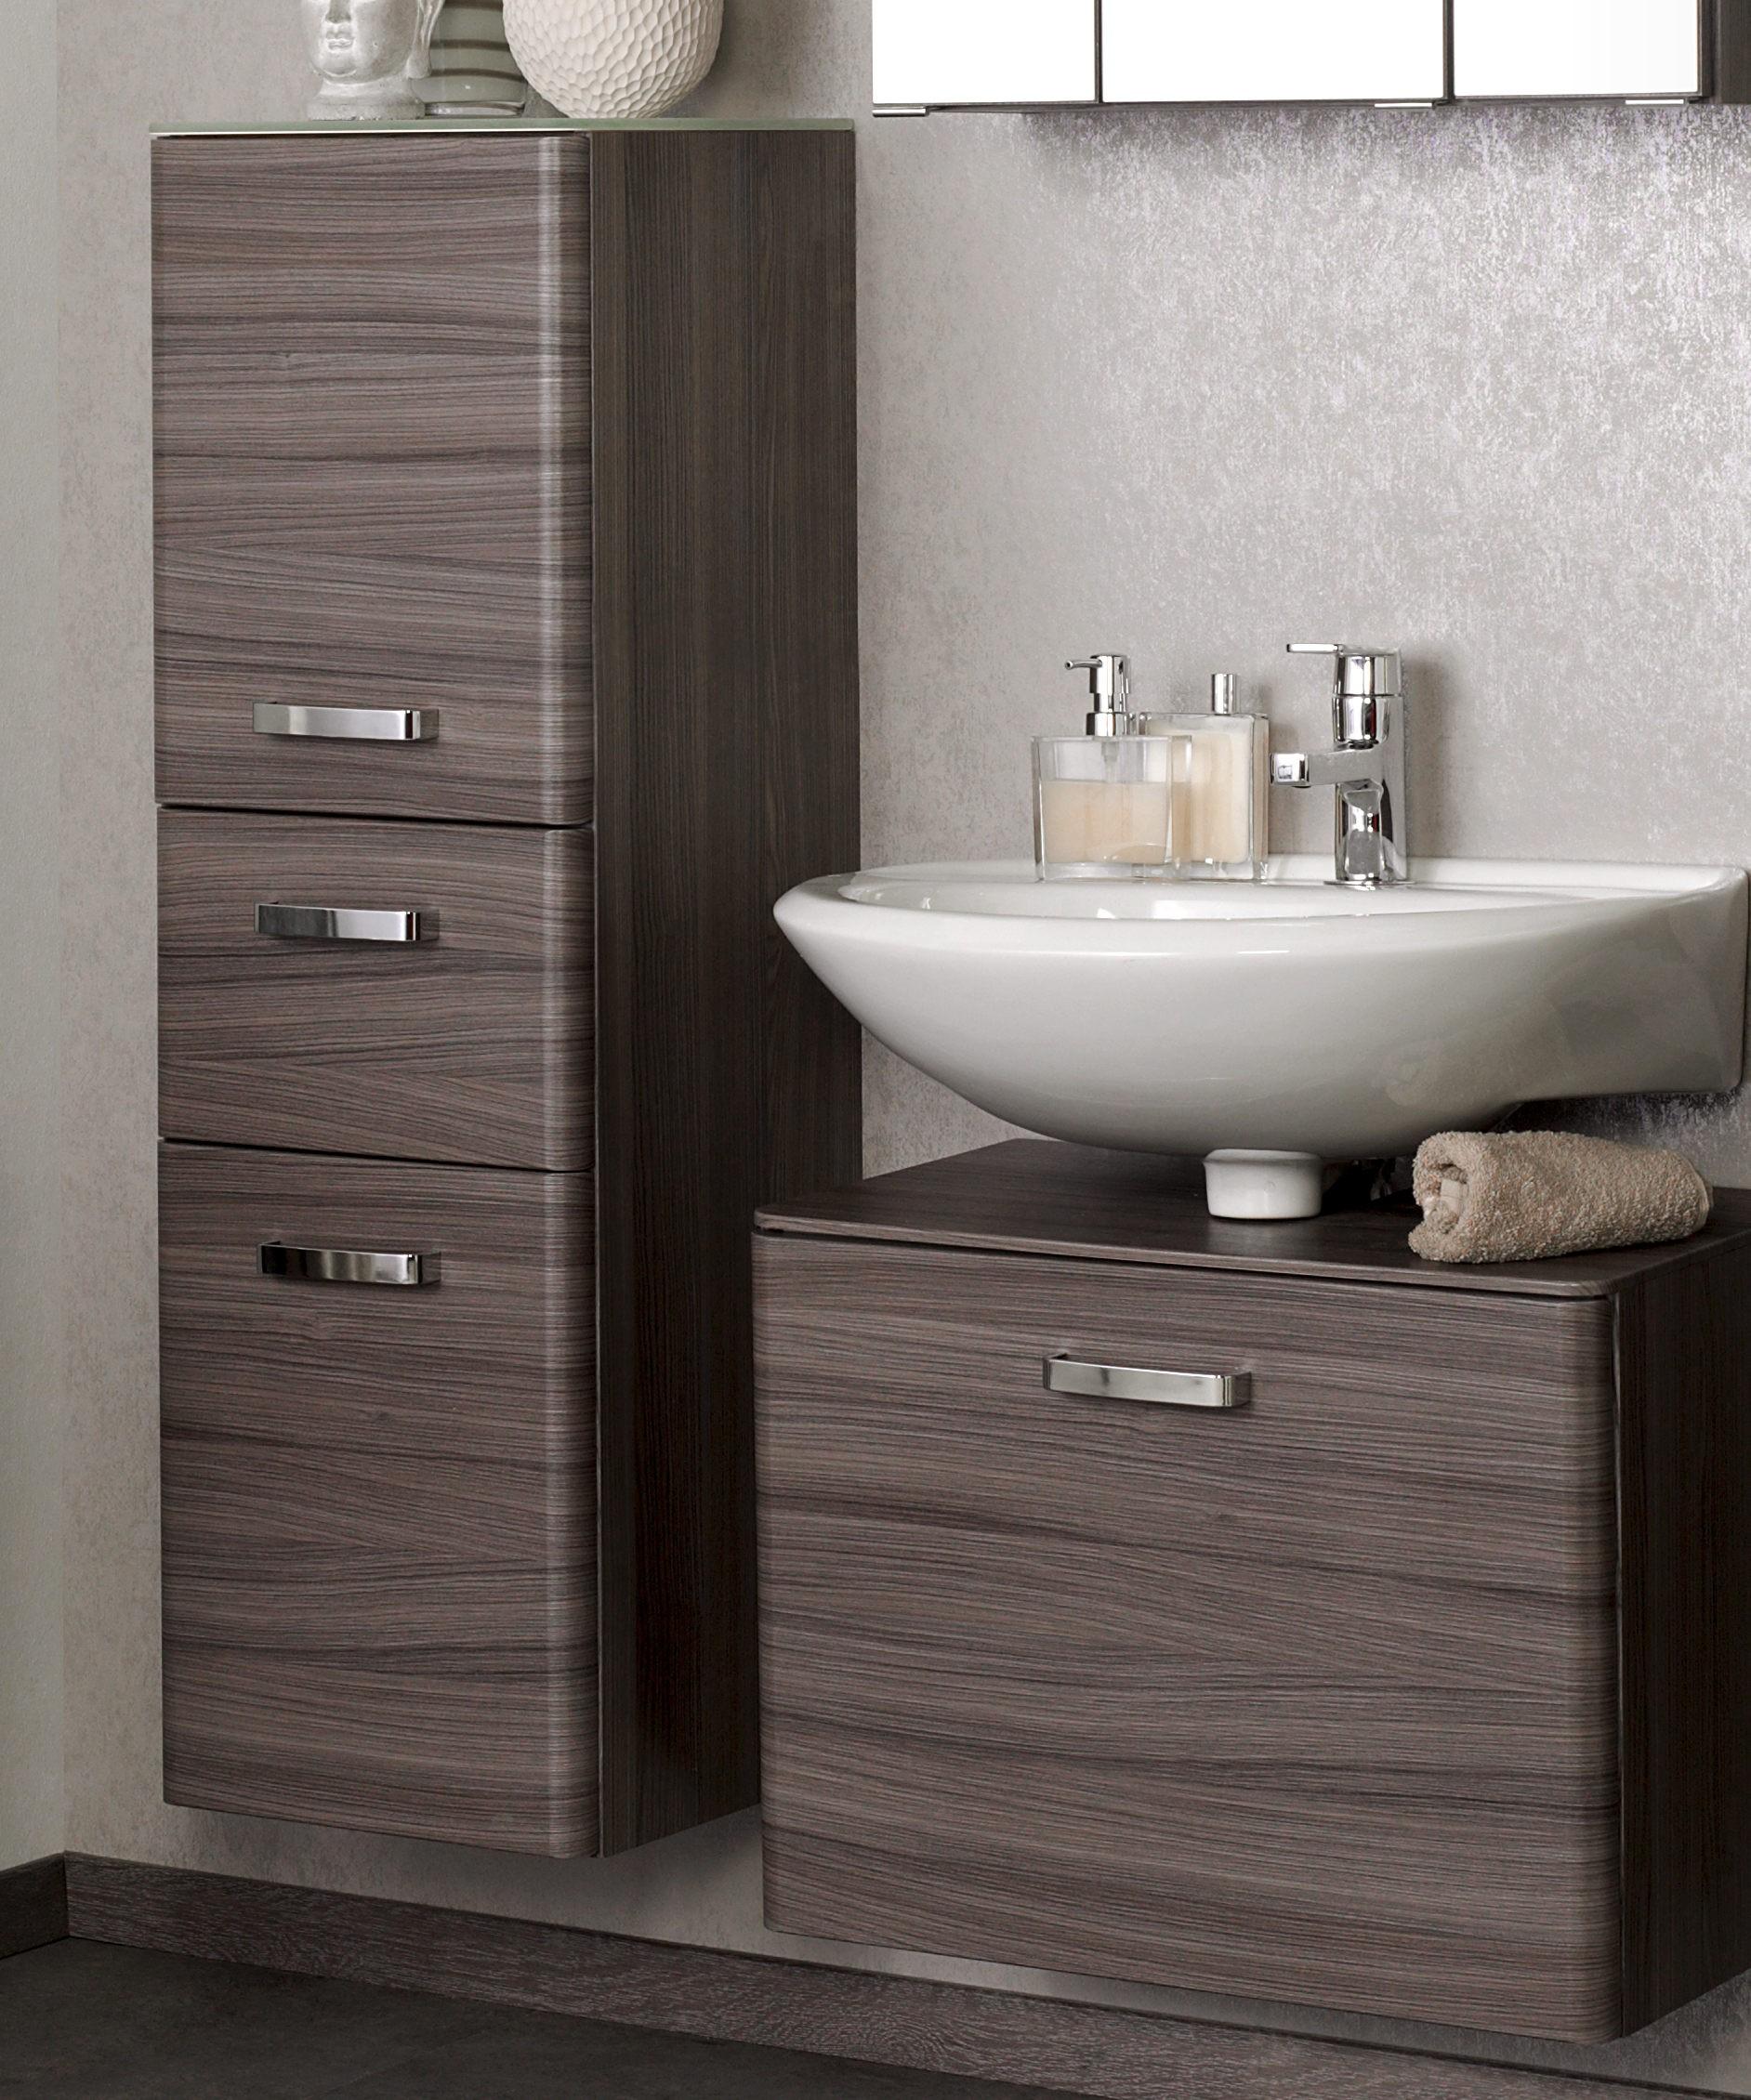 badm bel set phoenix 6 teilig 130 cm breit eiche. Black Bedroom Furniture Sets. Home Design Ideas